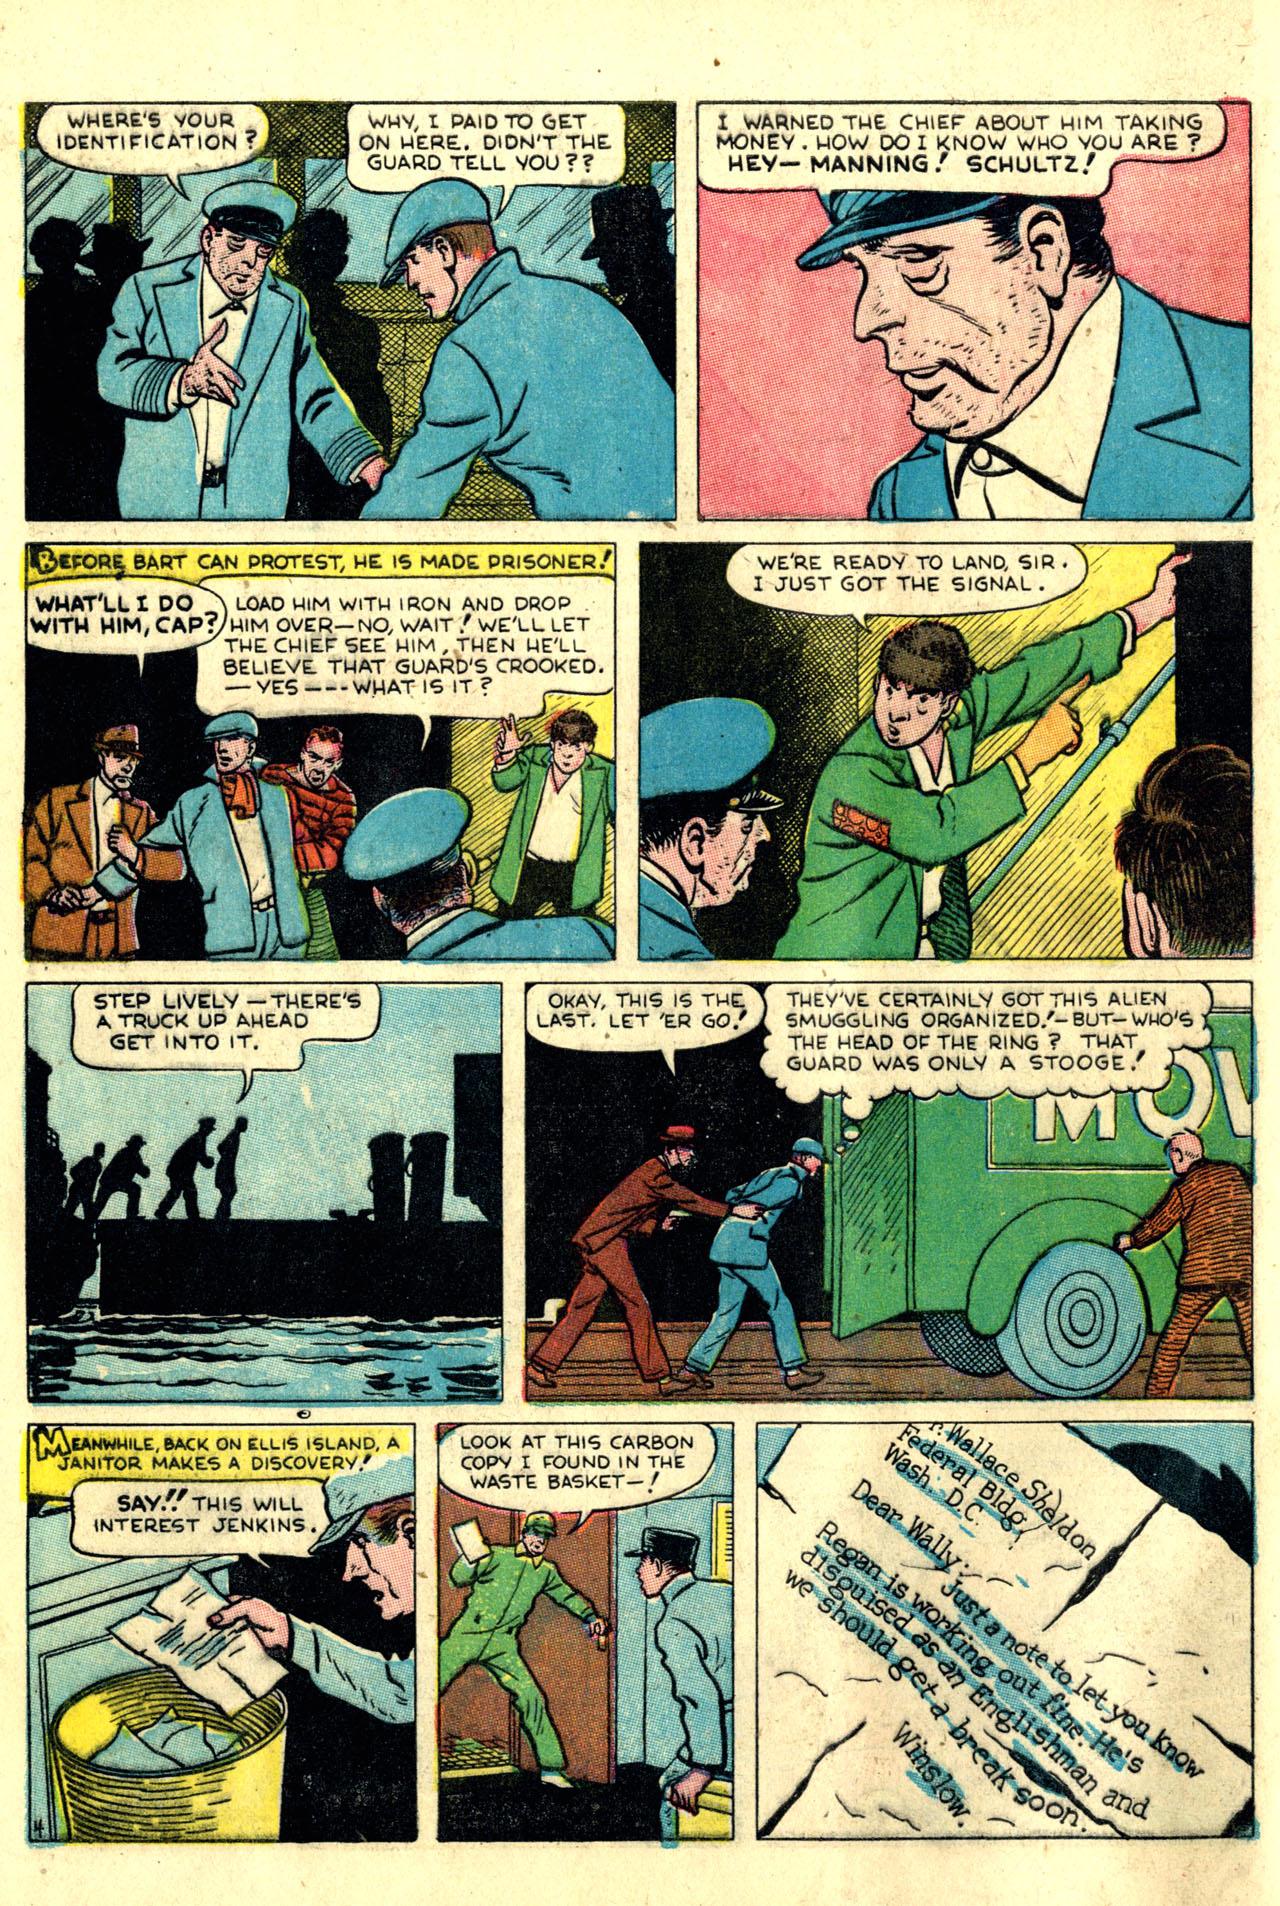 Read online Detective Comics (1937) comic -  Issue #44 - 20